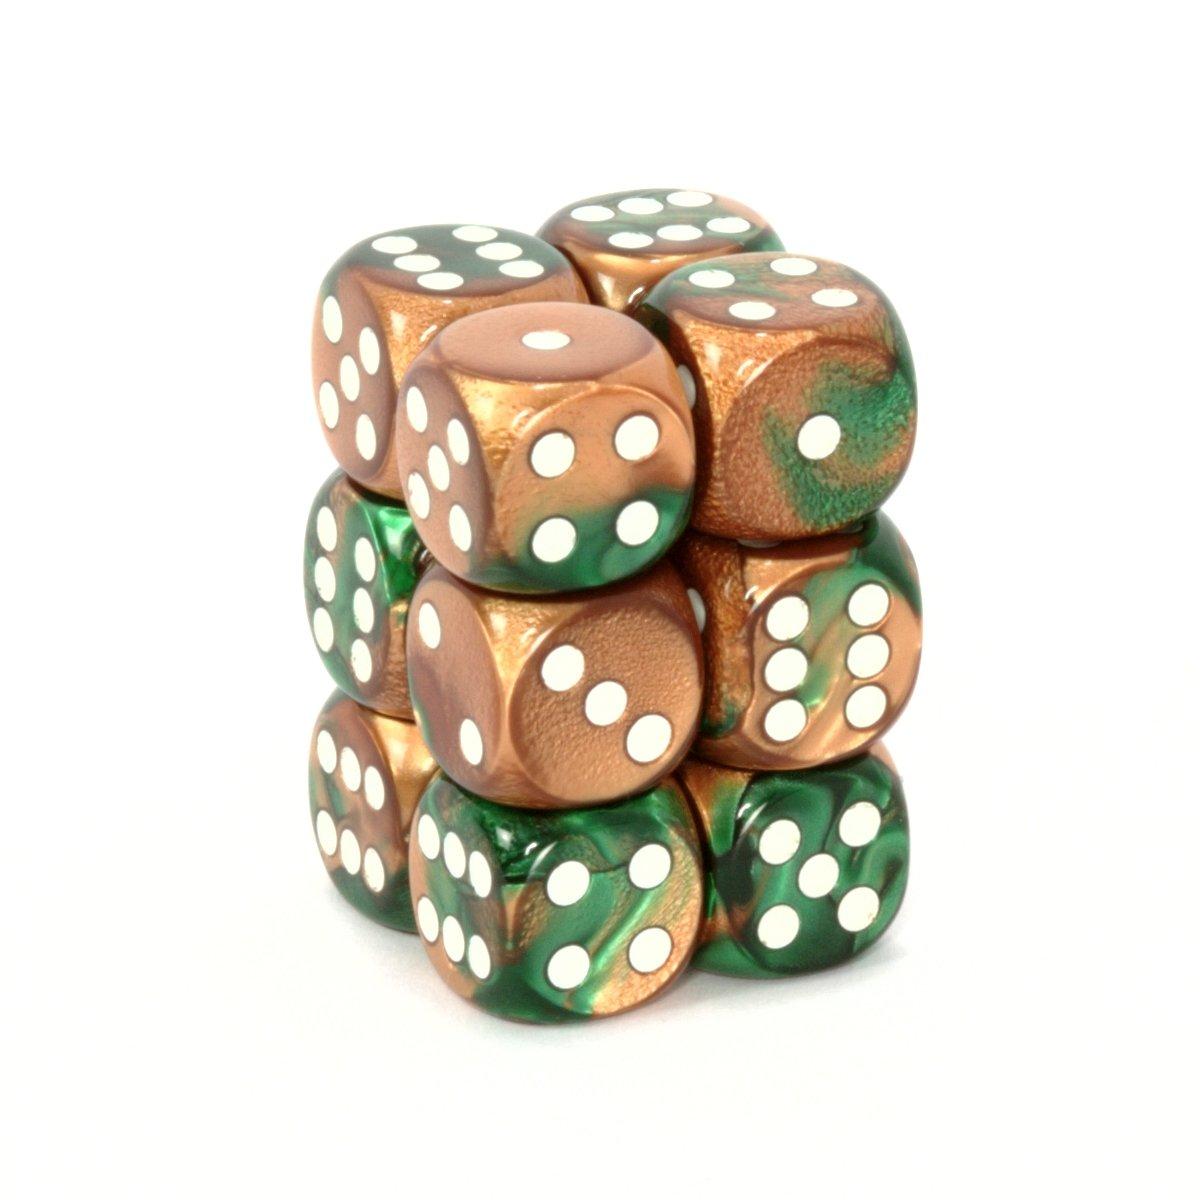 超特価SALE開催! Chessex Dice d6 B001EYYAVQ Sets: Gemini Copper & Green of Block with White - 16mm Six Sided Die (12) Block of Dice B001EYYAVQ, BULL BOO:54849dd0 --- cliente.opweb0005.servidorwebfacil.com